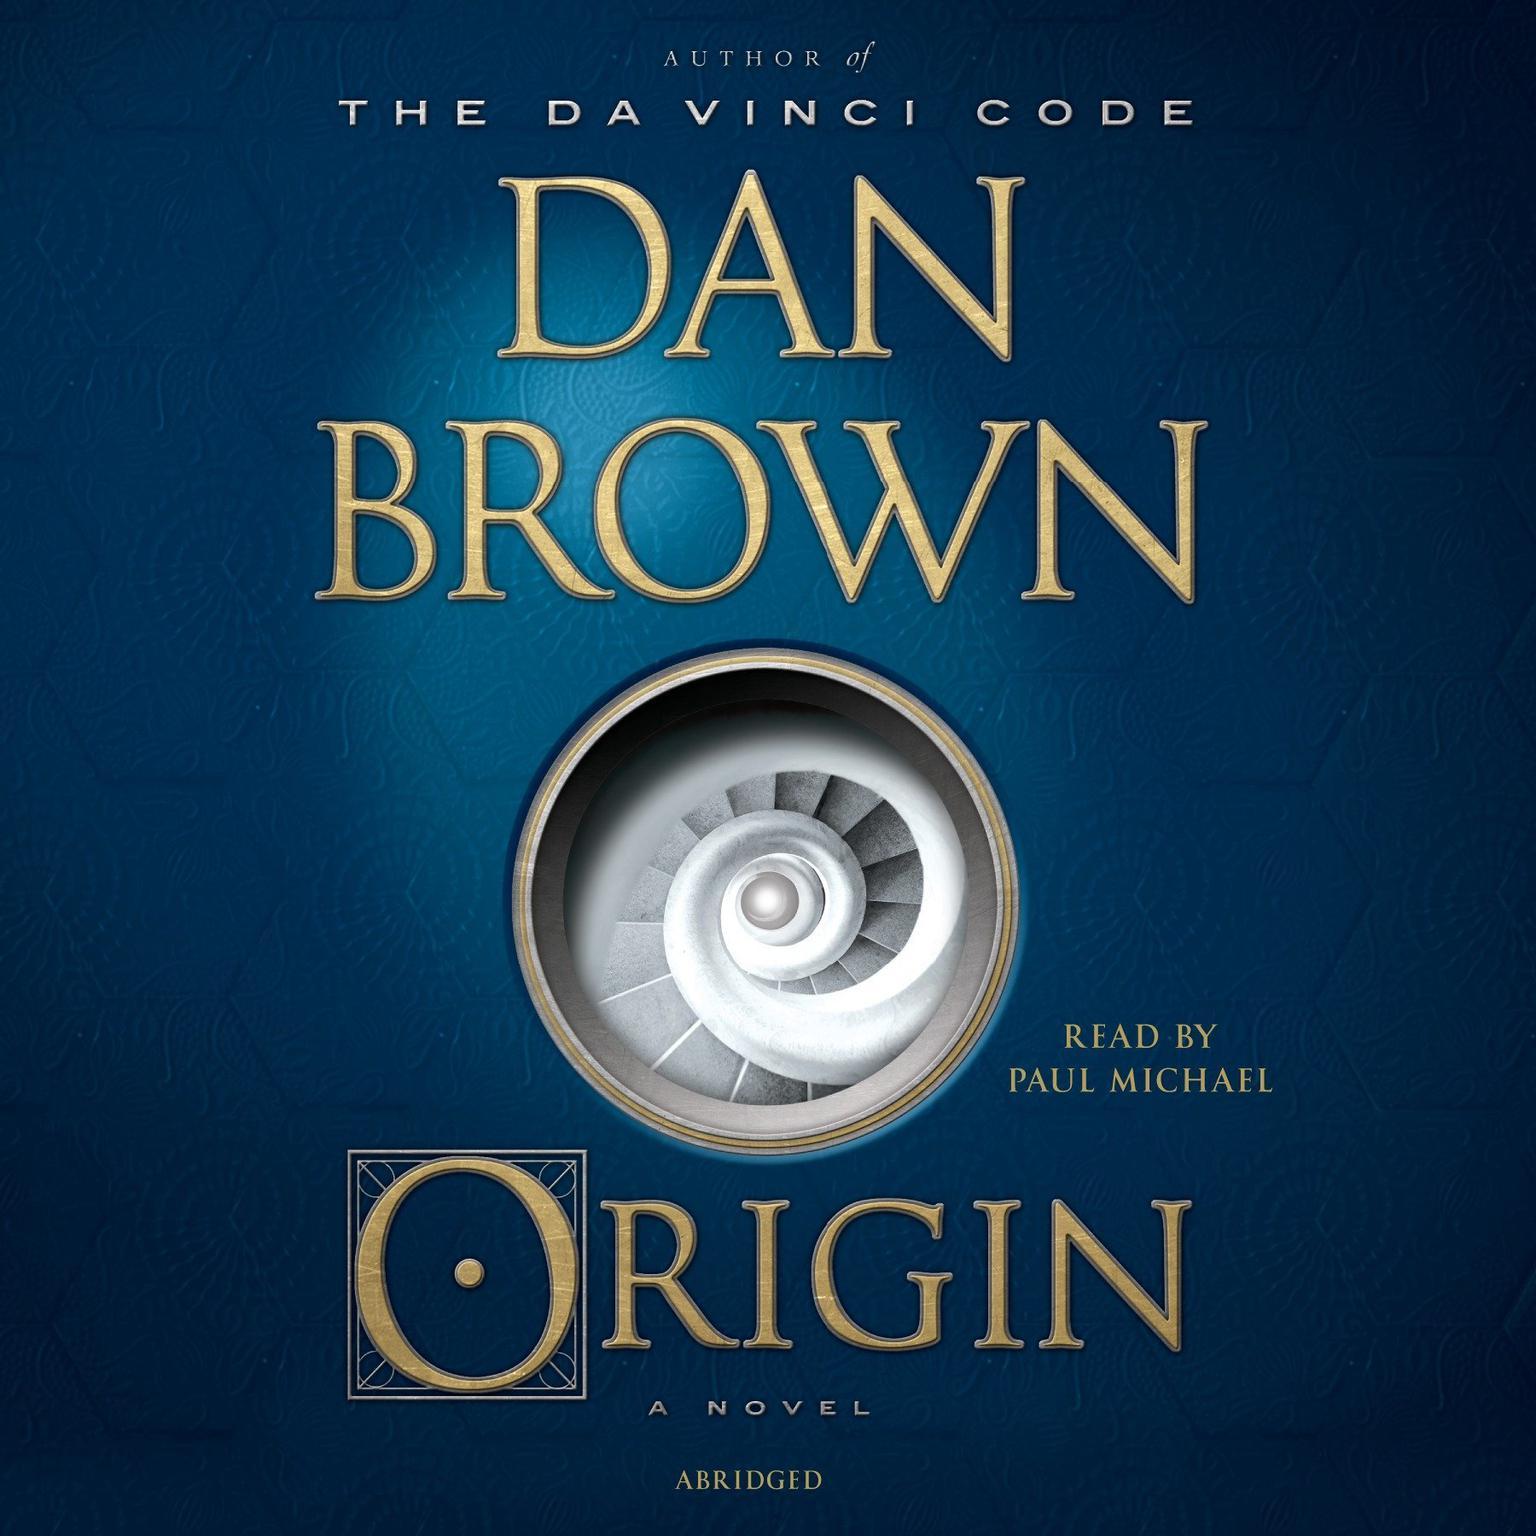 Origin (Abridged): A Novel Audiobook, by Dan Brown